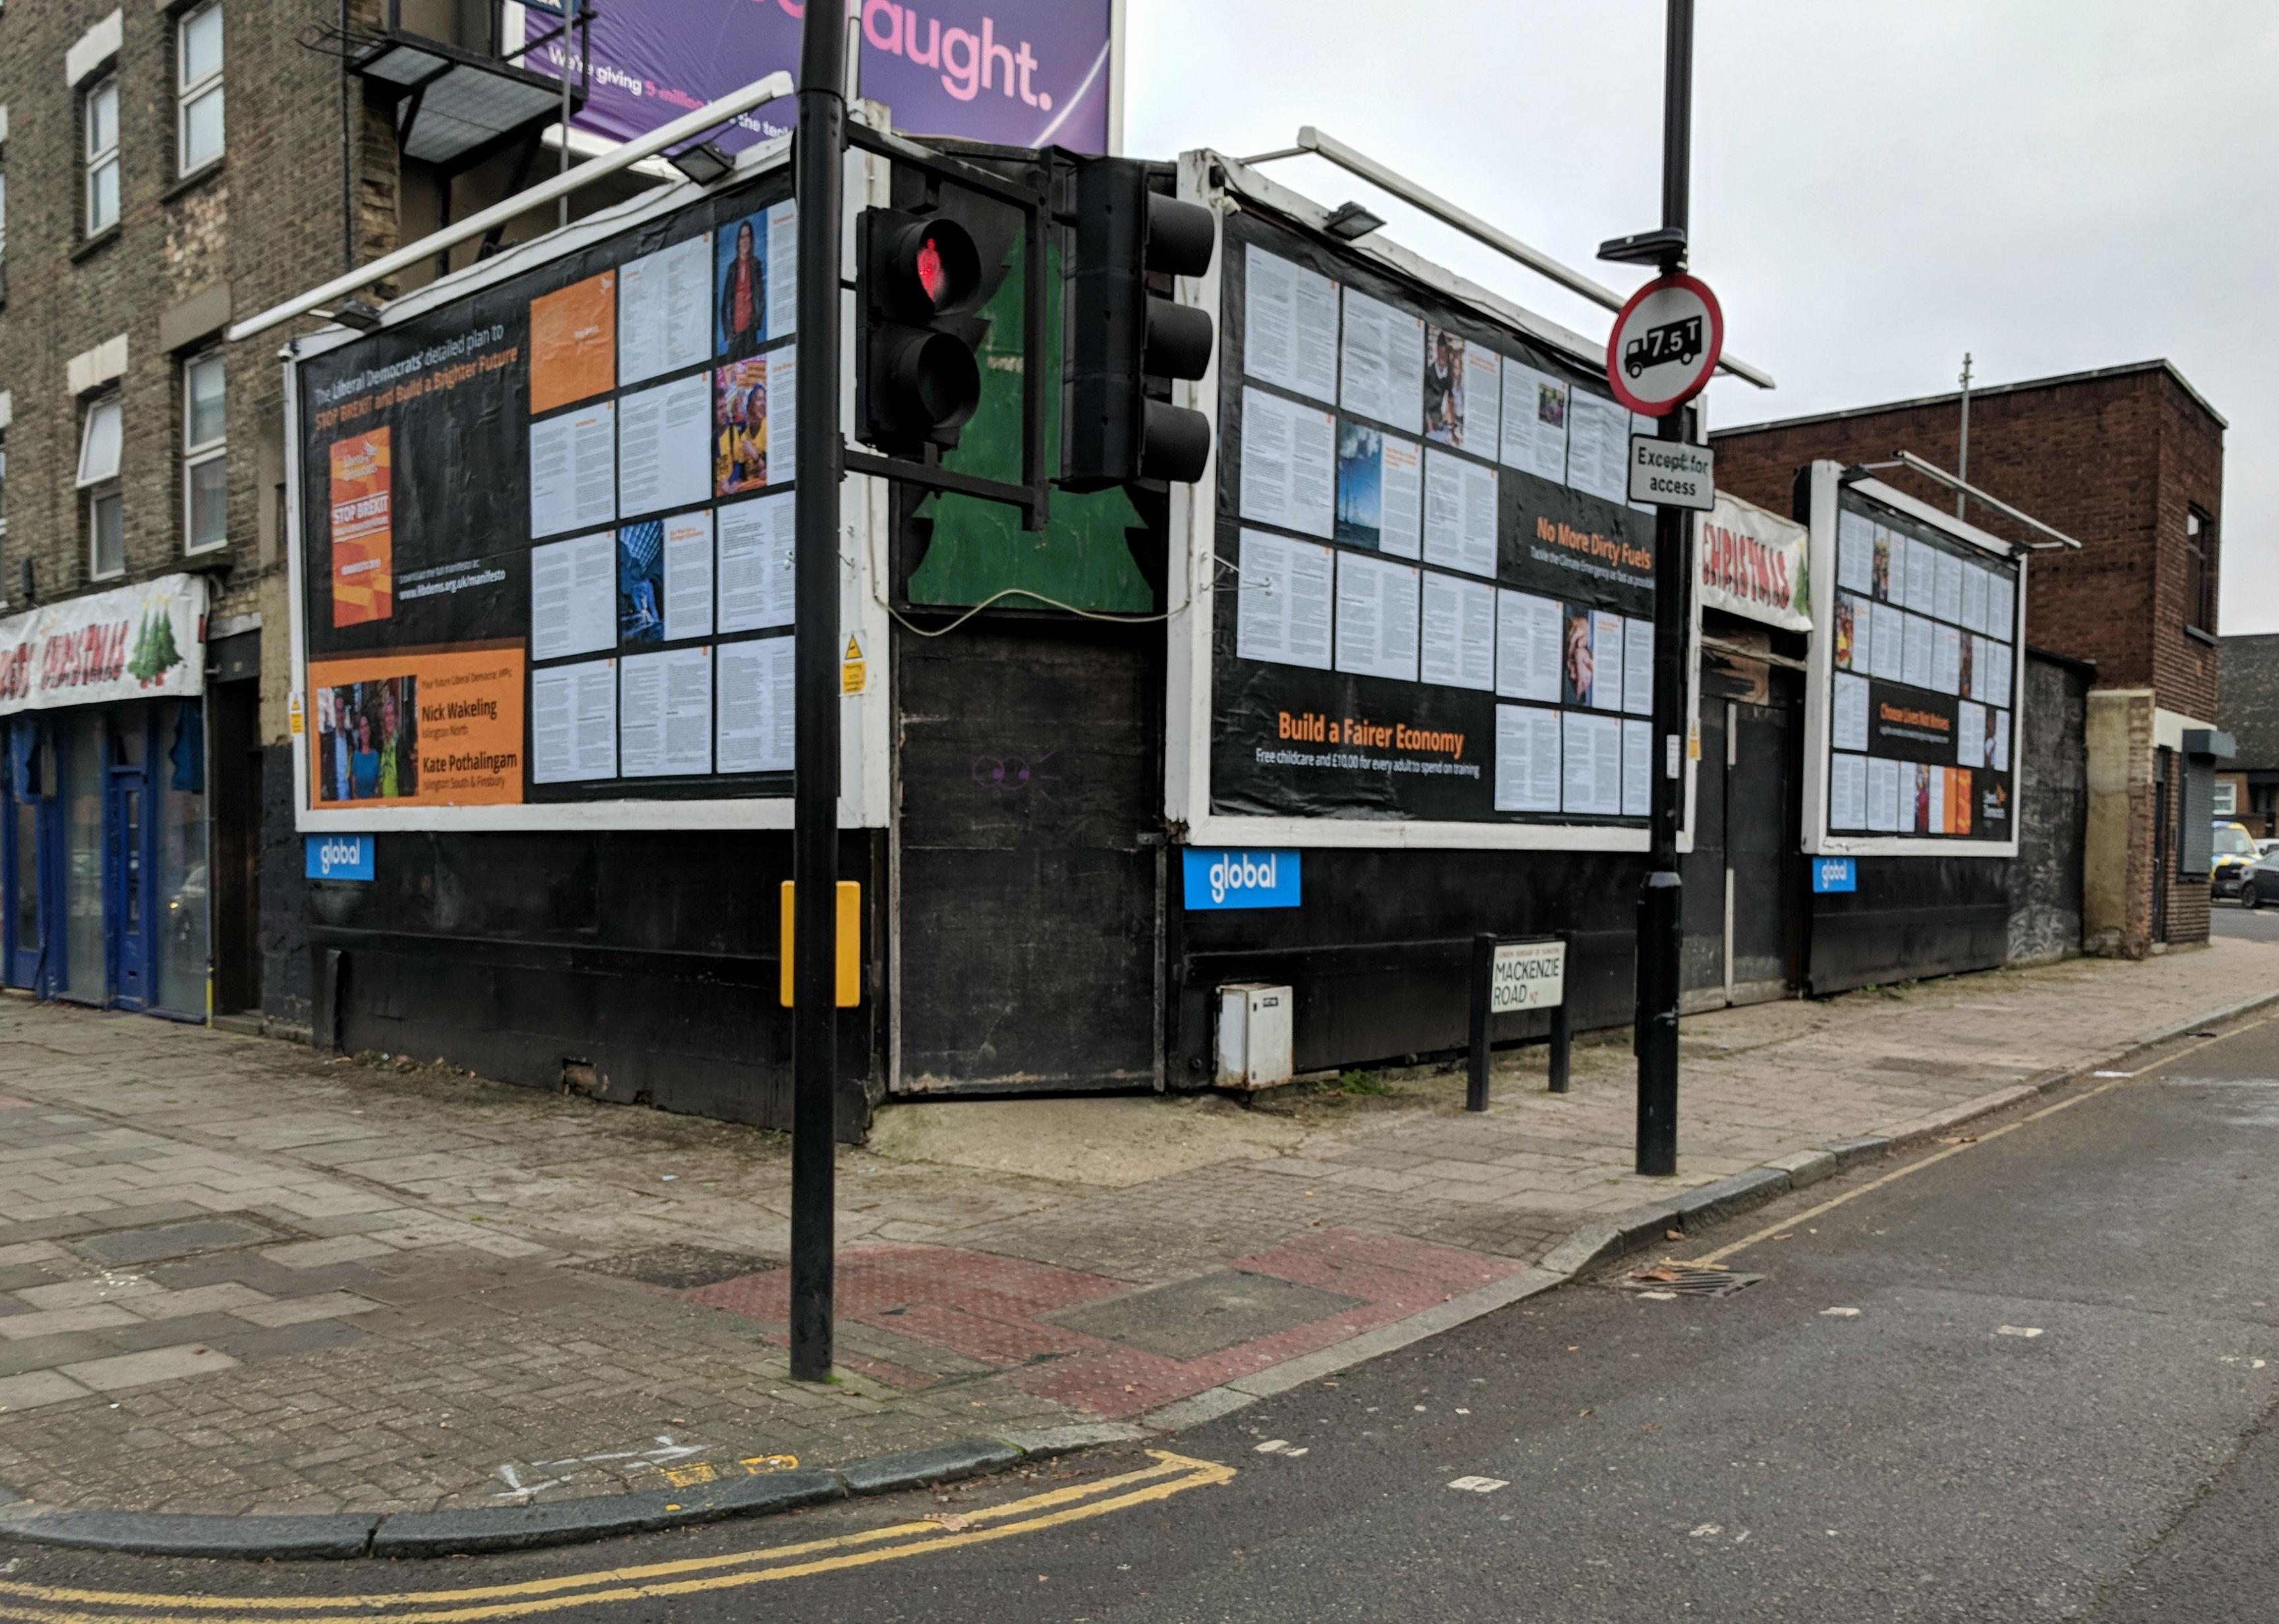 Entire Liberal Democrat manifesto blazoned on Islington billboards